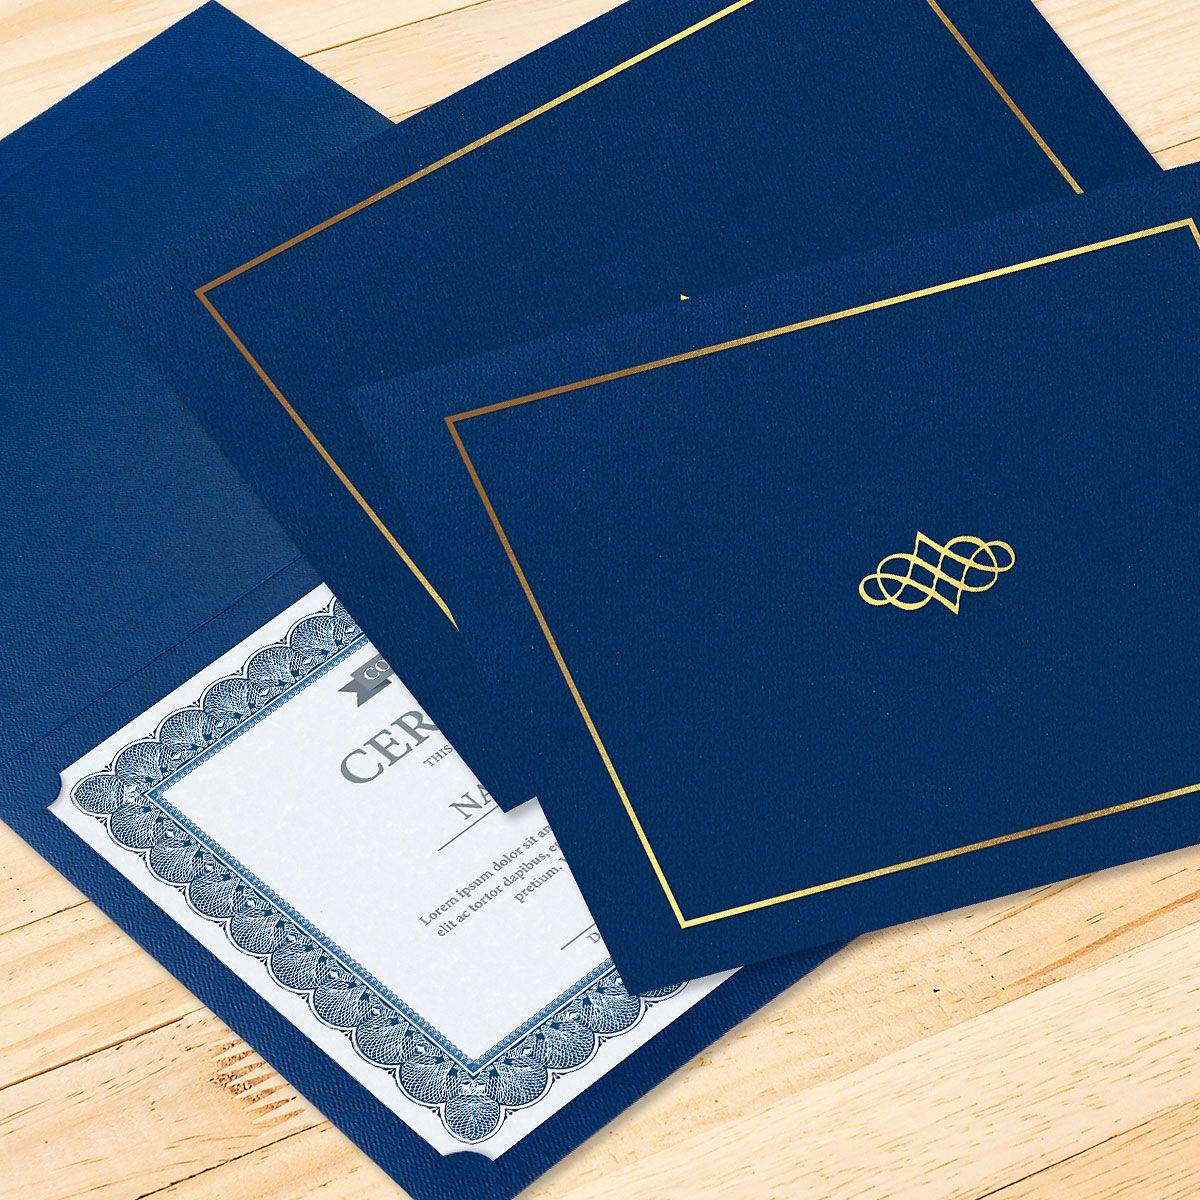 Ornate Blue Certificate Jacket with Gold Border/Crest